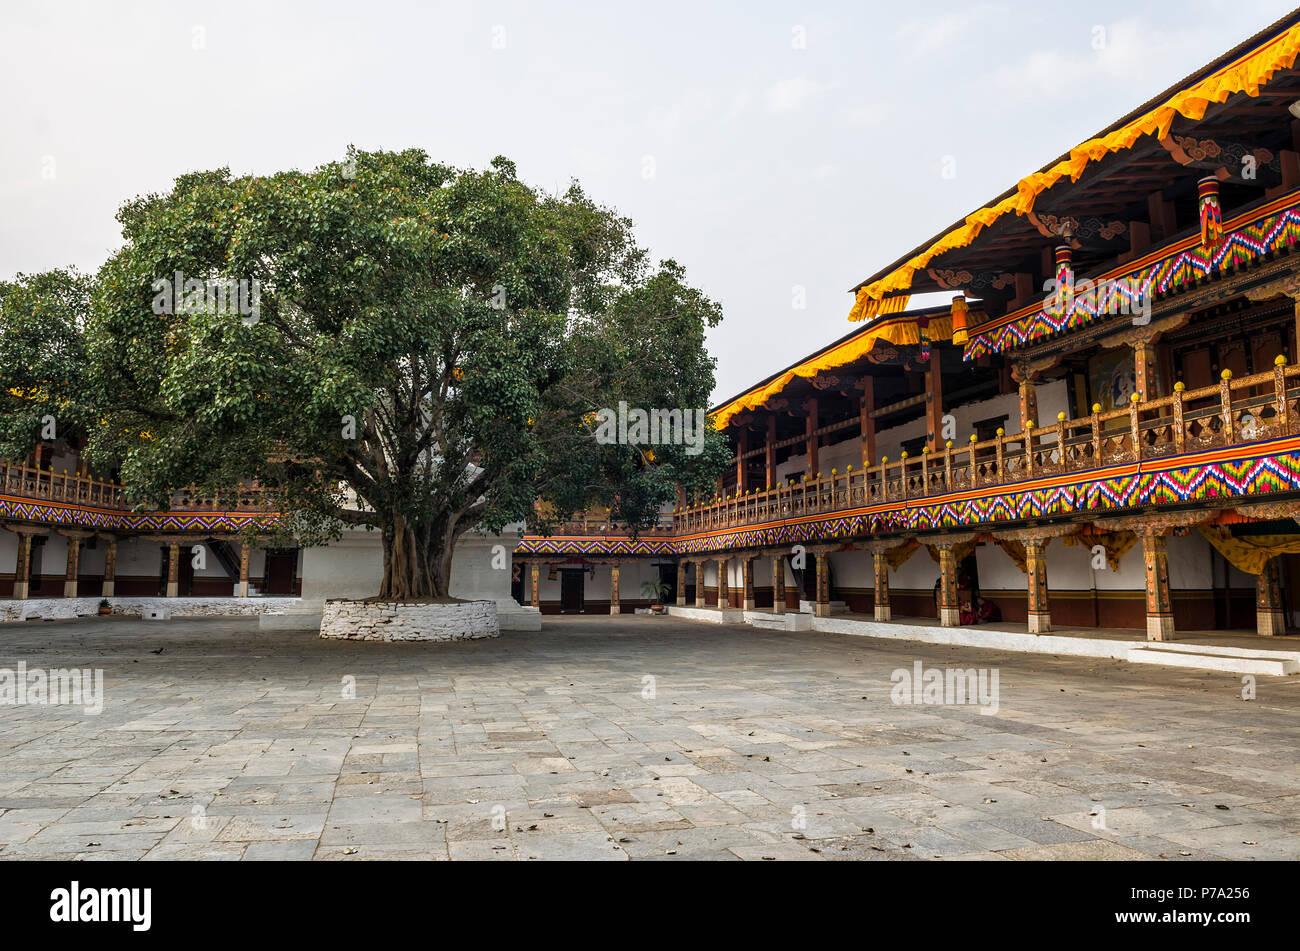 Punakha Dzong and bodhi tree, Bhutan - Punakha Dzong or Pungthang Dewachen Phodrang (Palace of Great Happiness) in Punakha, the old capital of Bhutan. - Stock Image